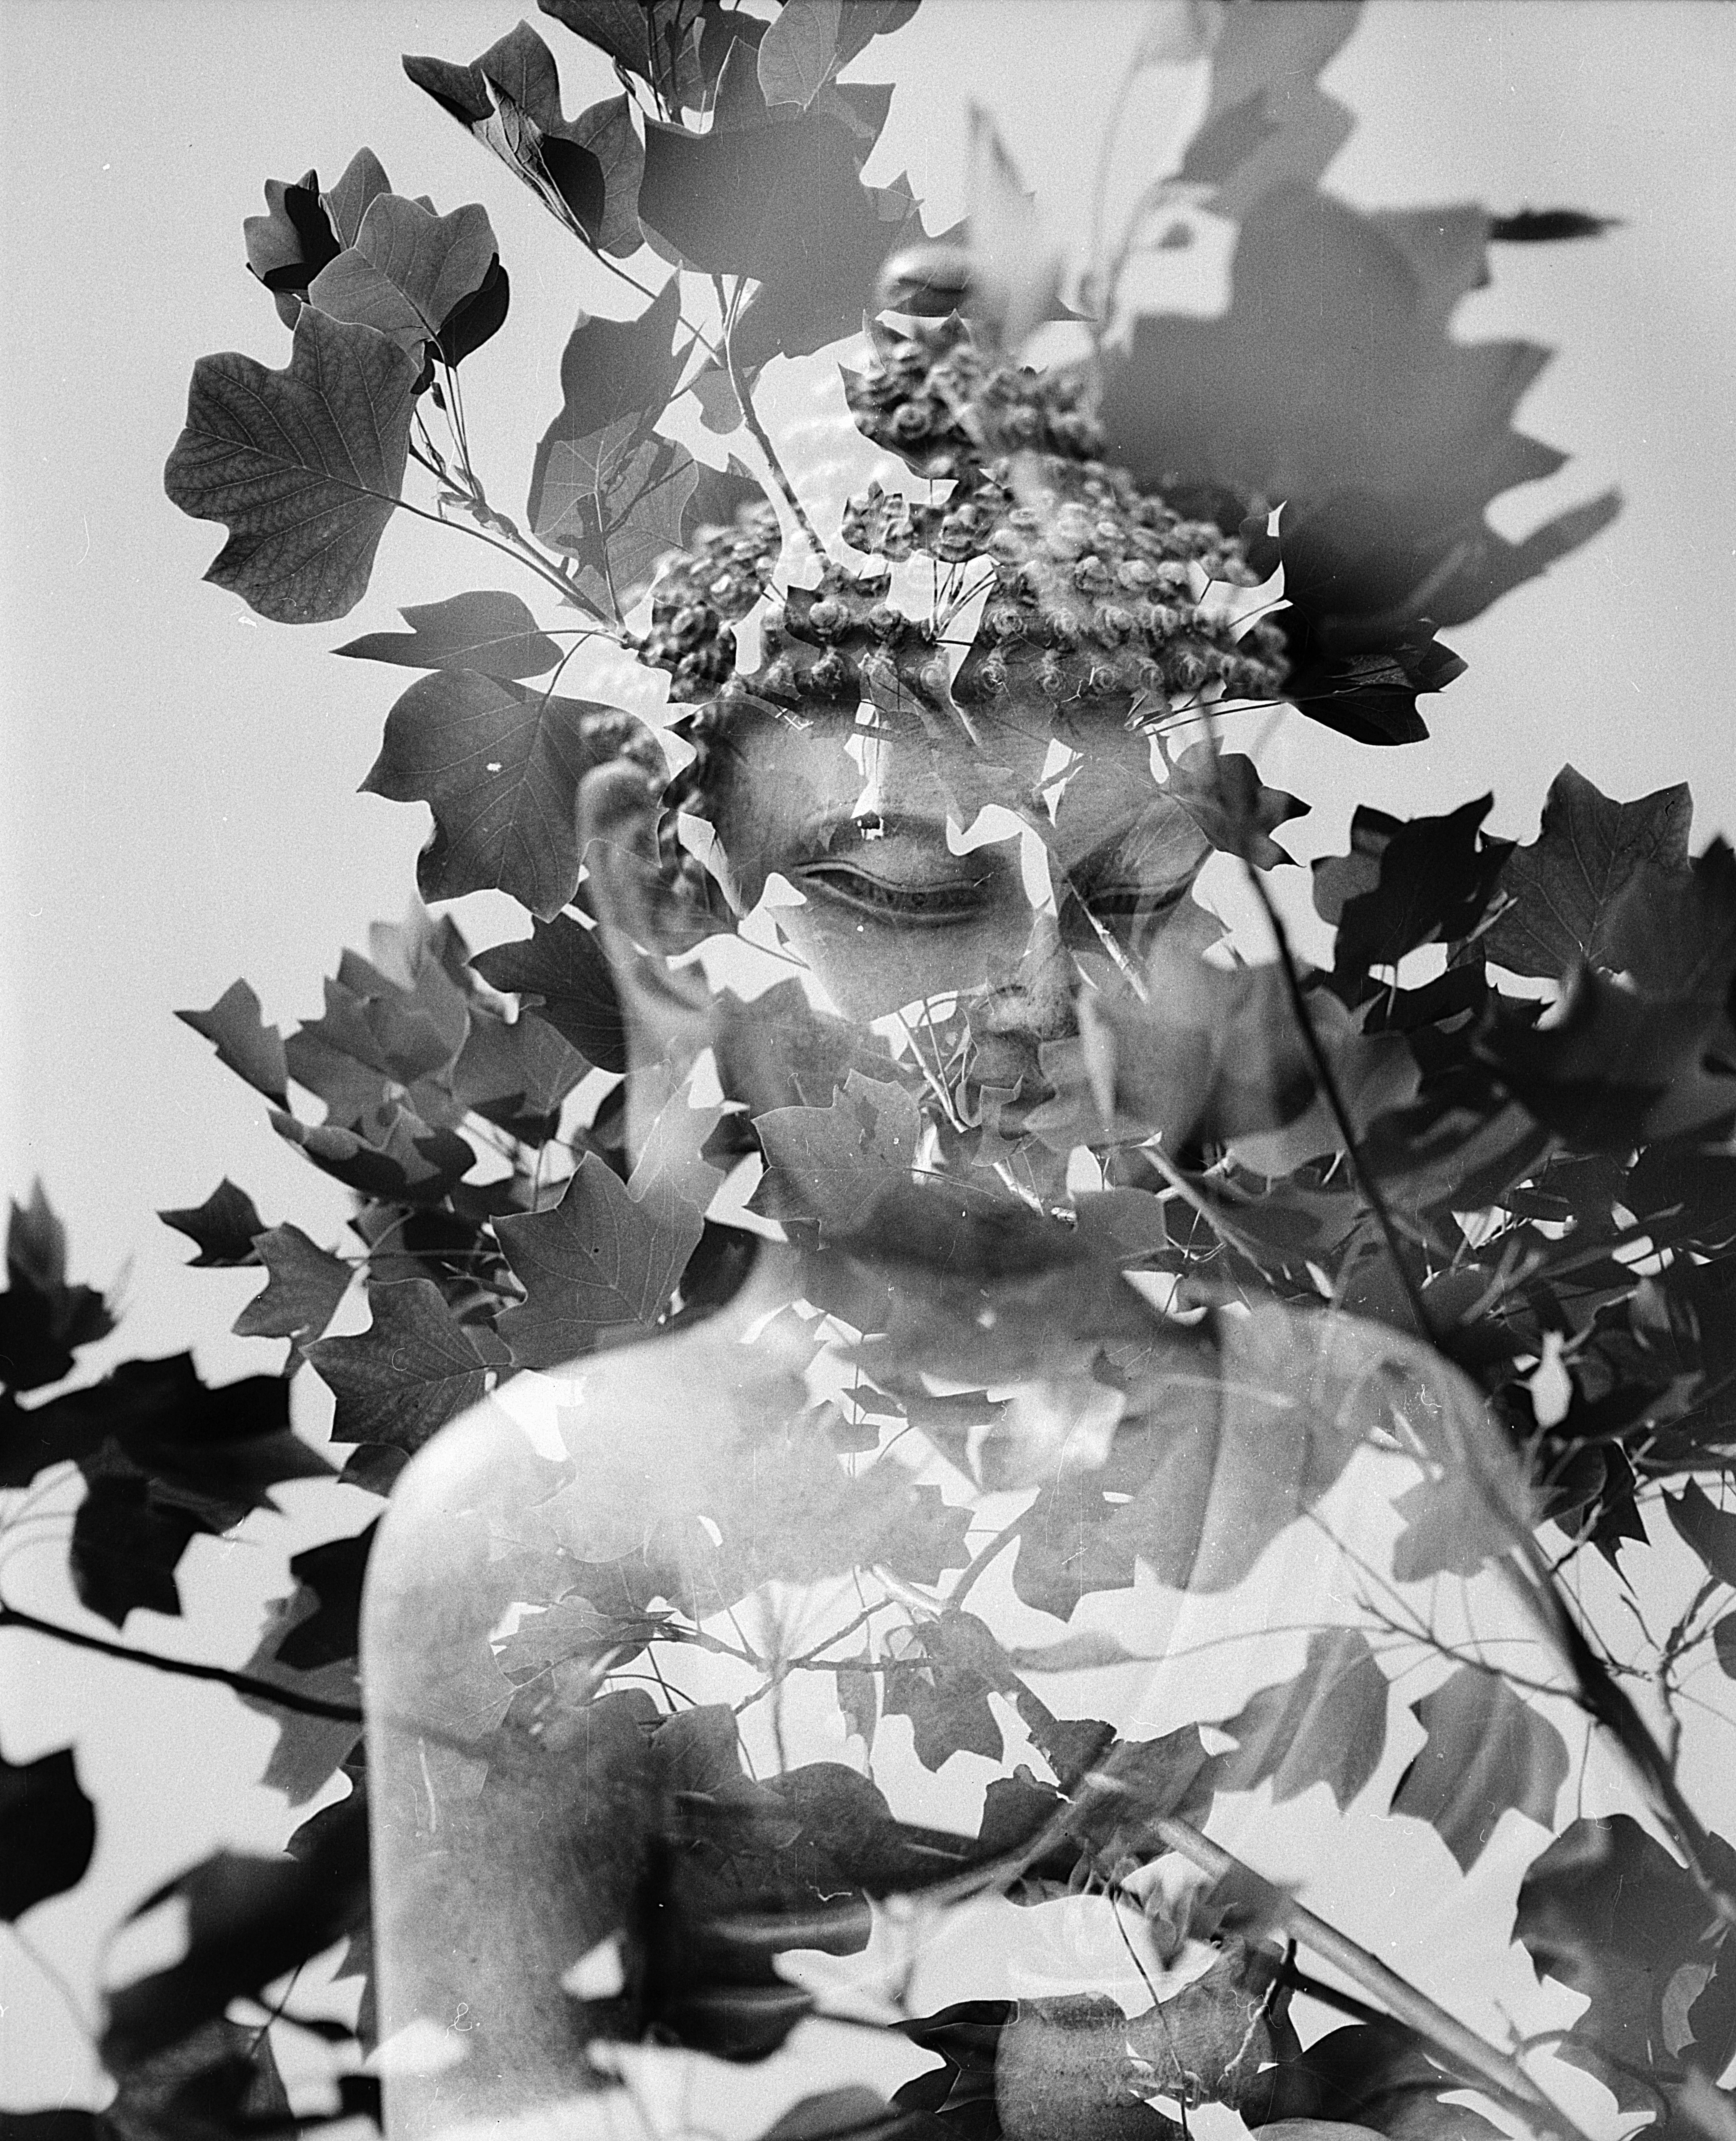 Free images black and white statue sculpture art cool image illustration photograph buddha 180mm i mamiya 6x7 mediumformat rb67 multiexpo